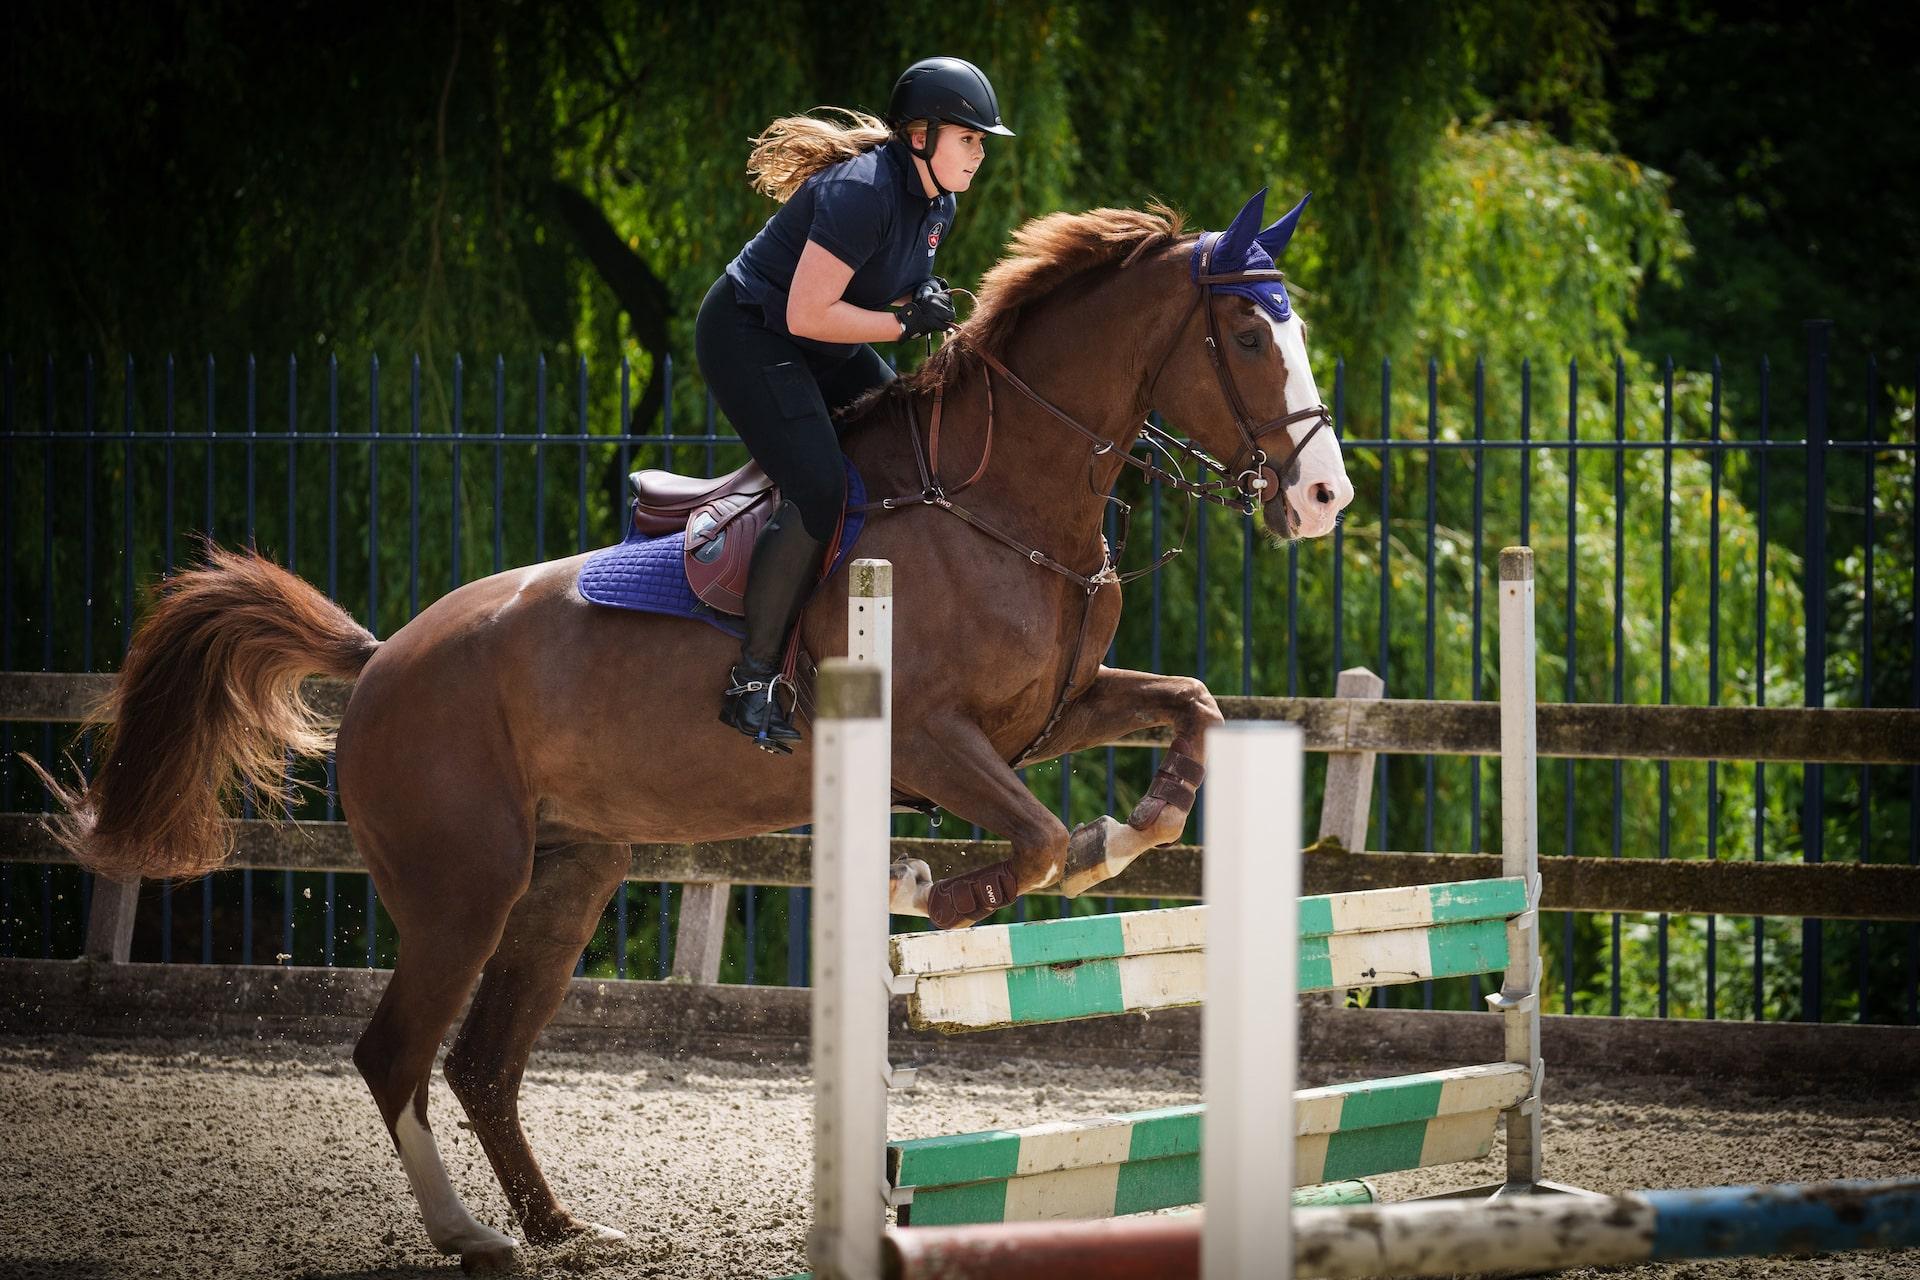 Prinzessin Amalia mit Pferd